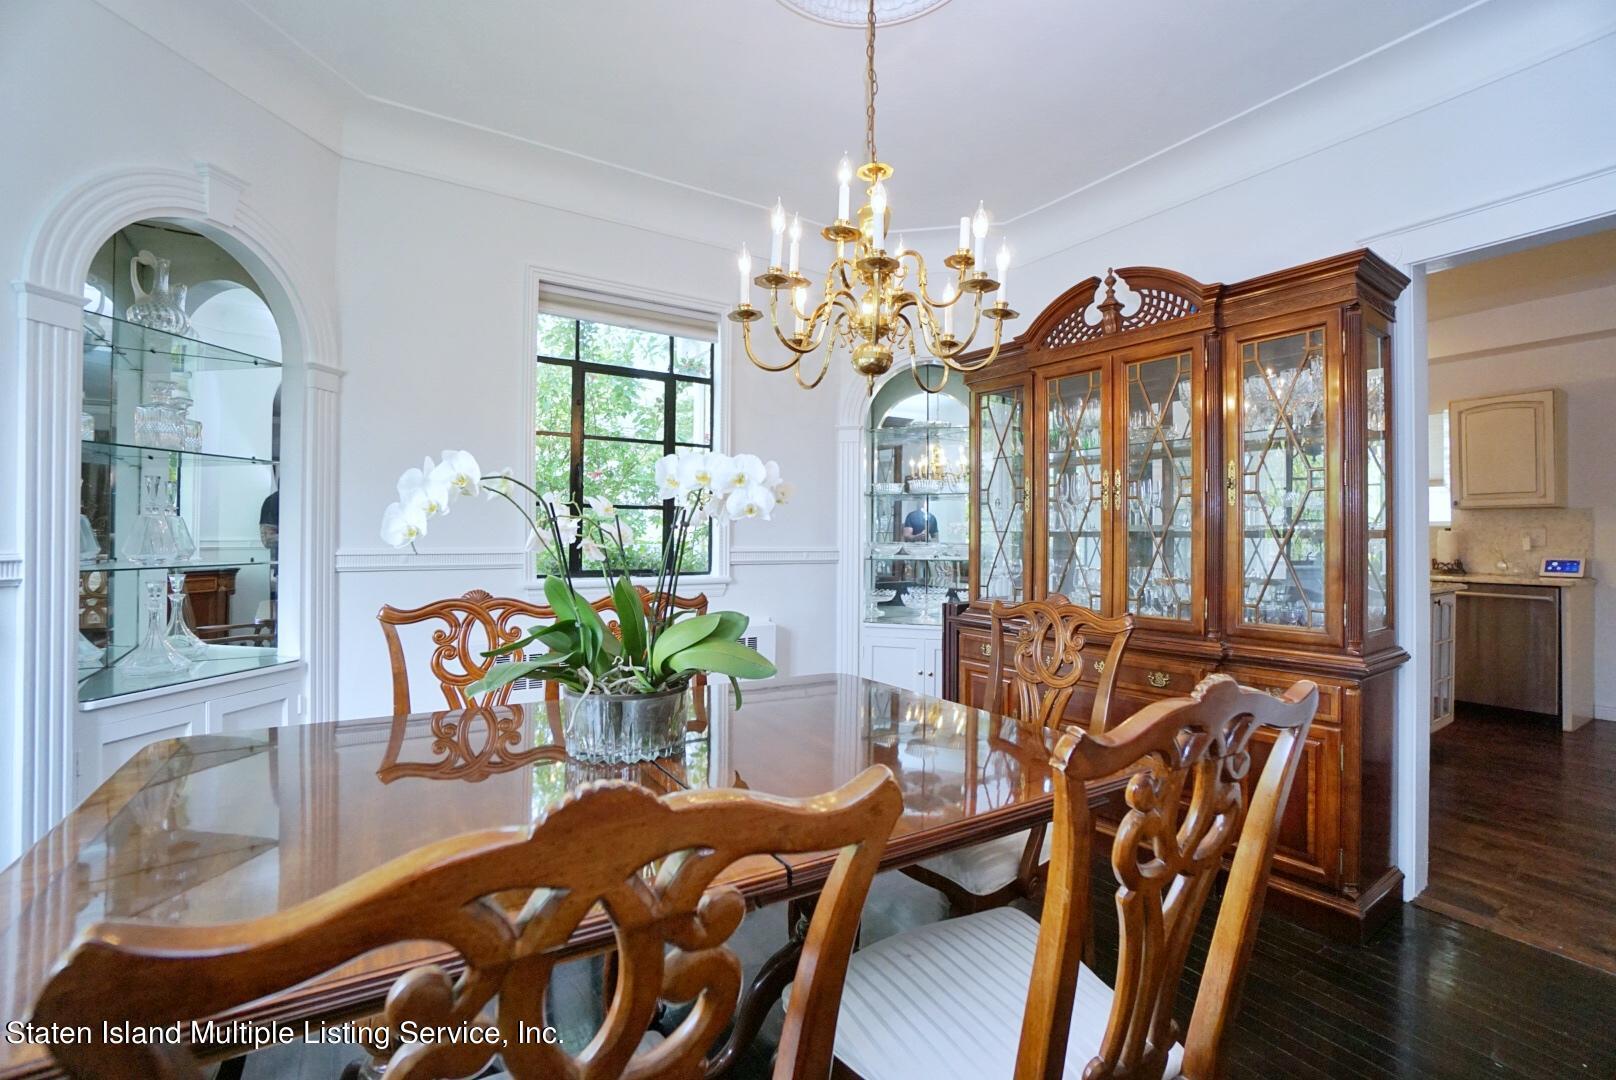 Single Family - Detached 311 Bement Avenue  Staten Island, NY 10310, MLS-1147133-14